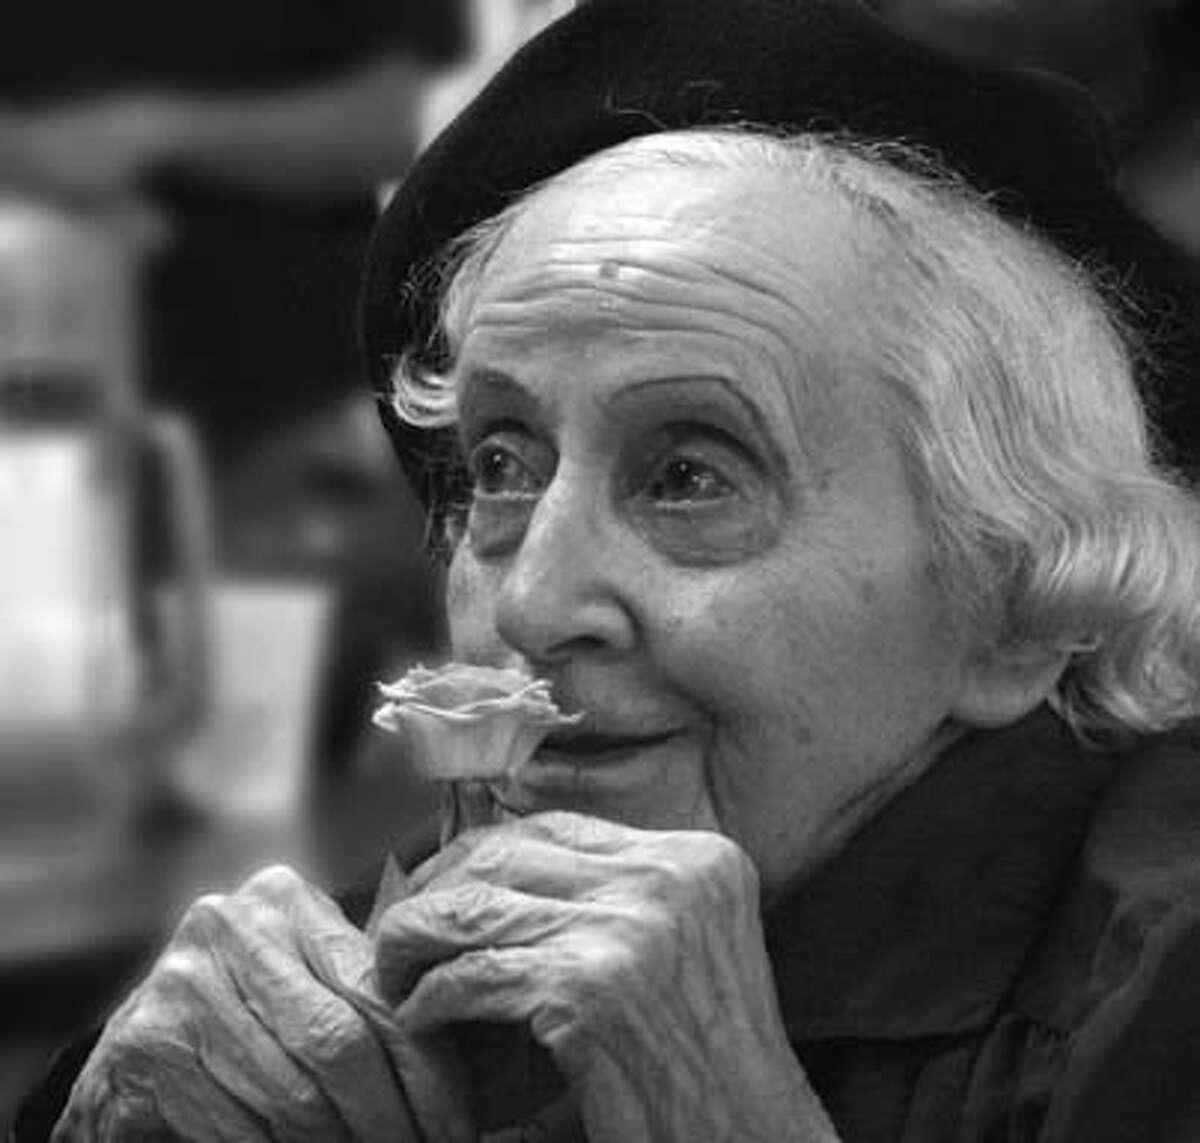 Obituary photo of Helen Parish.